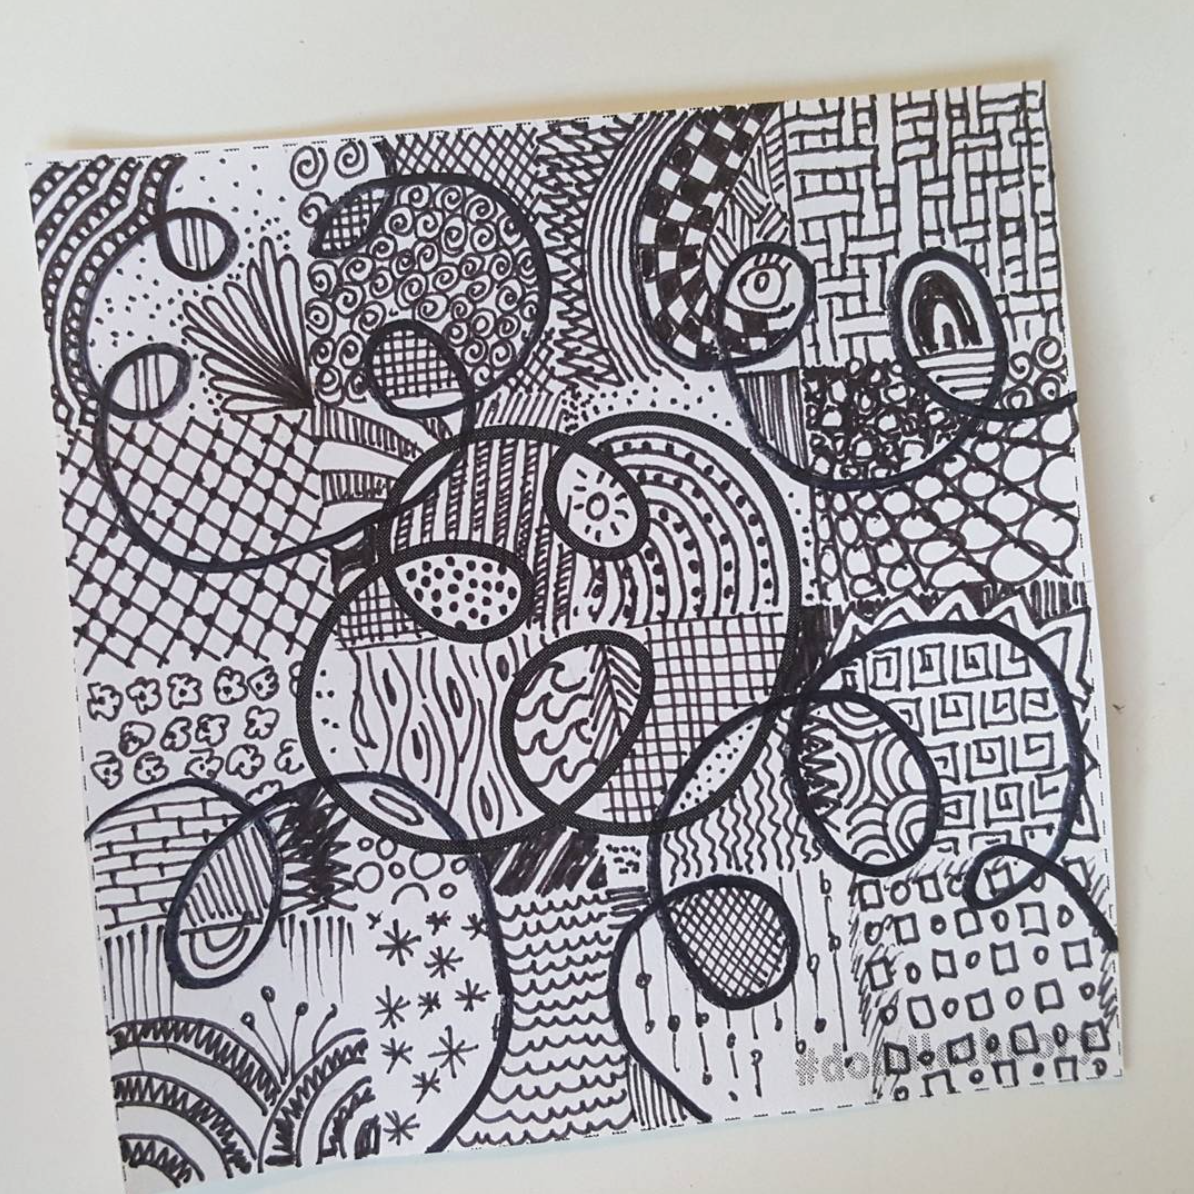 Drawn by Brenda Kaya from Toronto, Canada. Instagram: @brenda.kaya